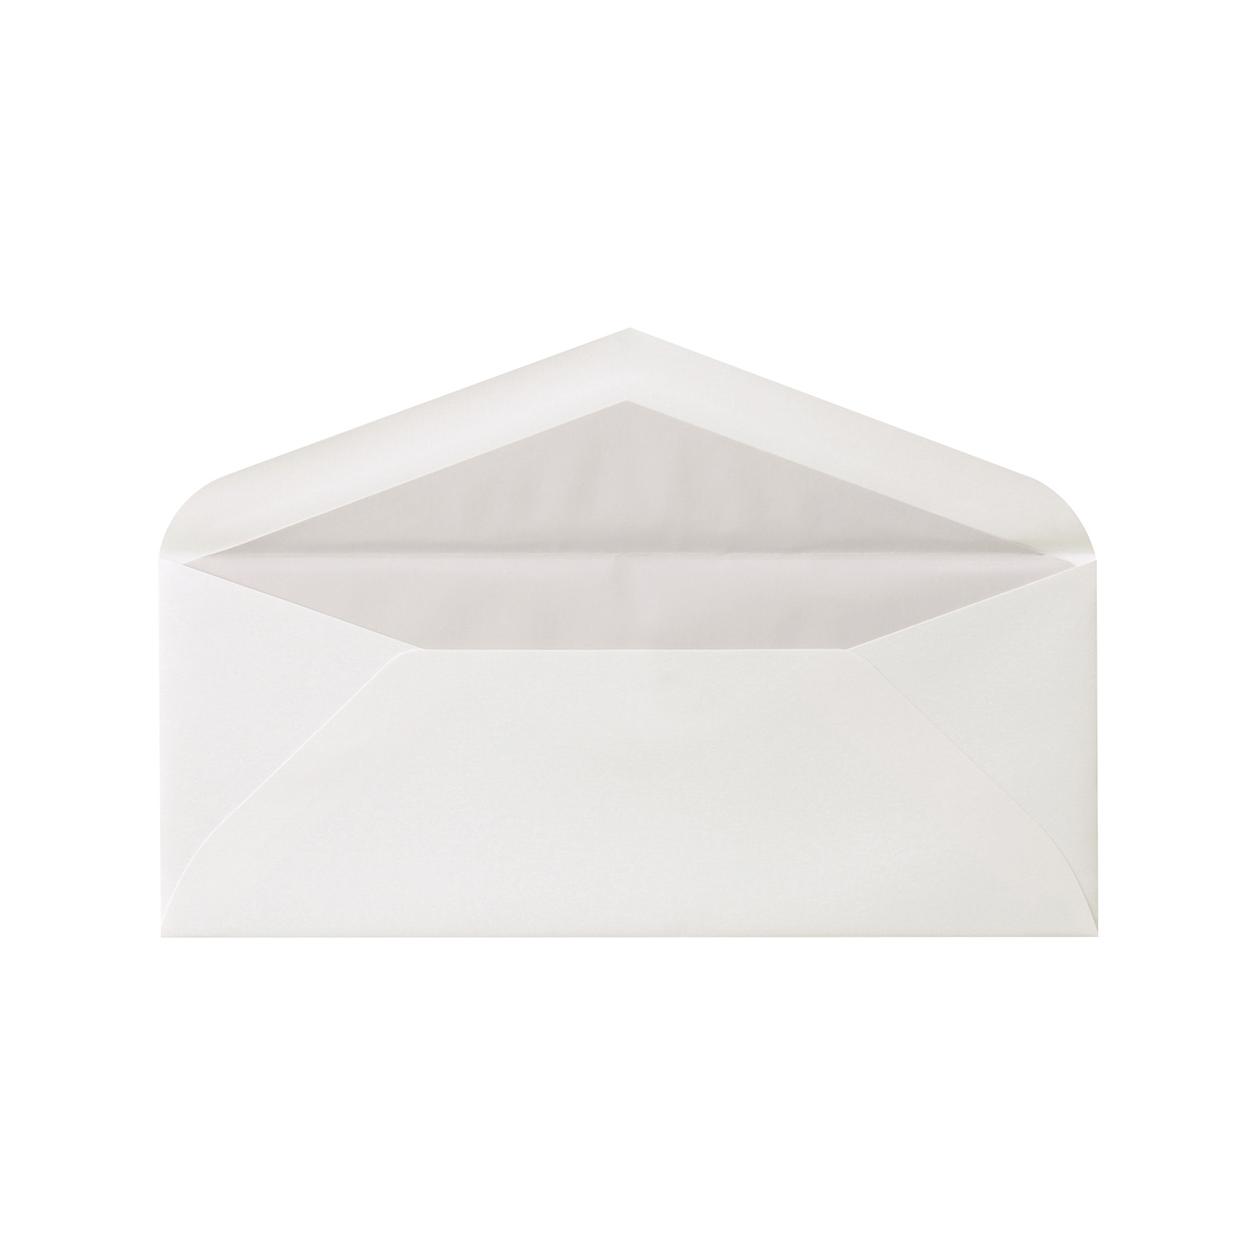 DLSダイア二重封筒 コットン スノーホワイト 116.3g